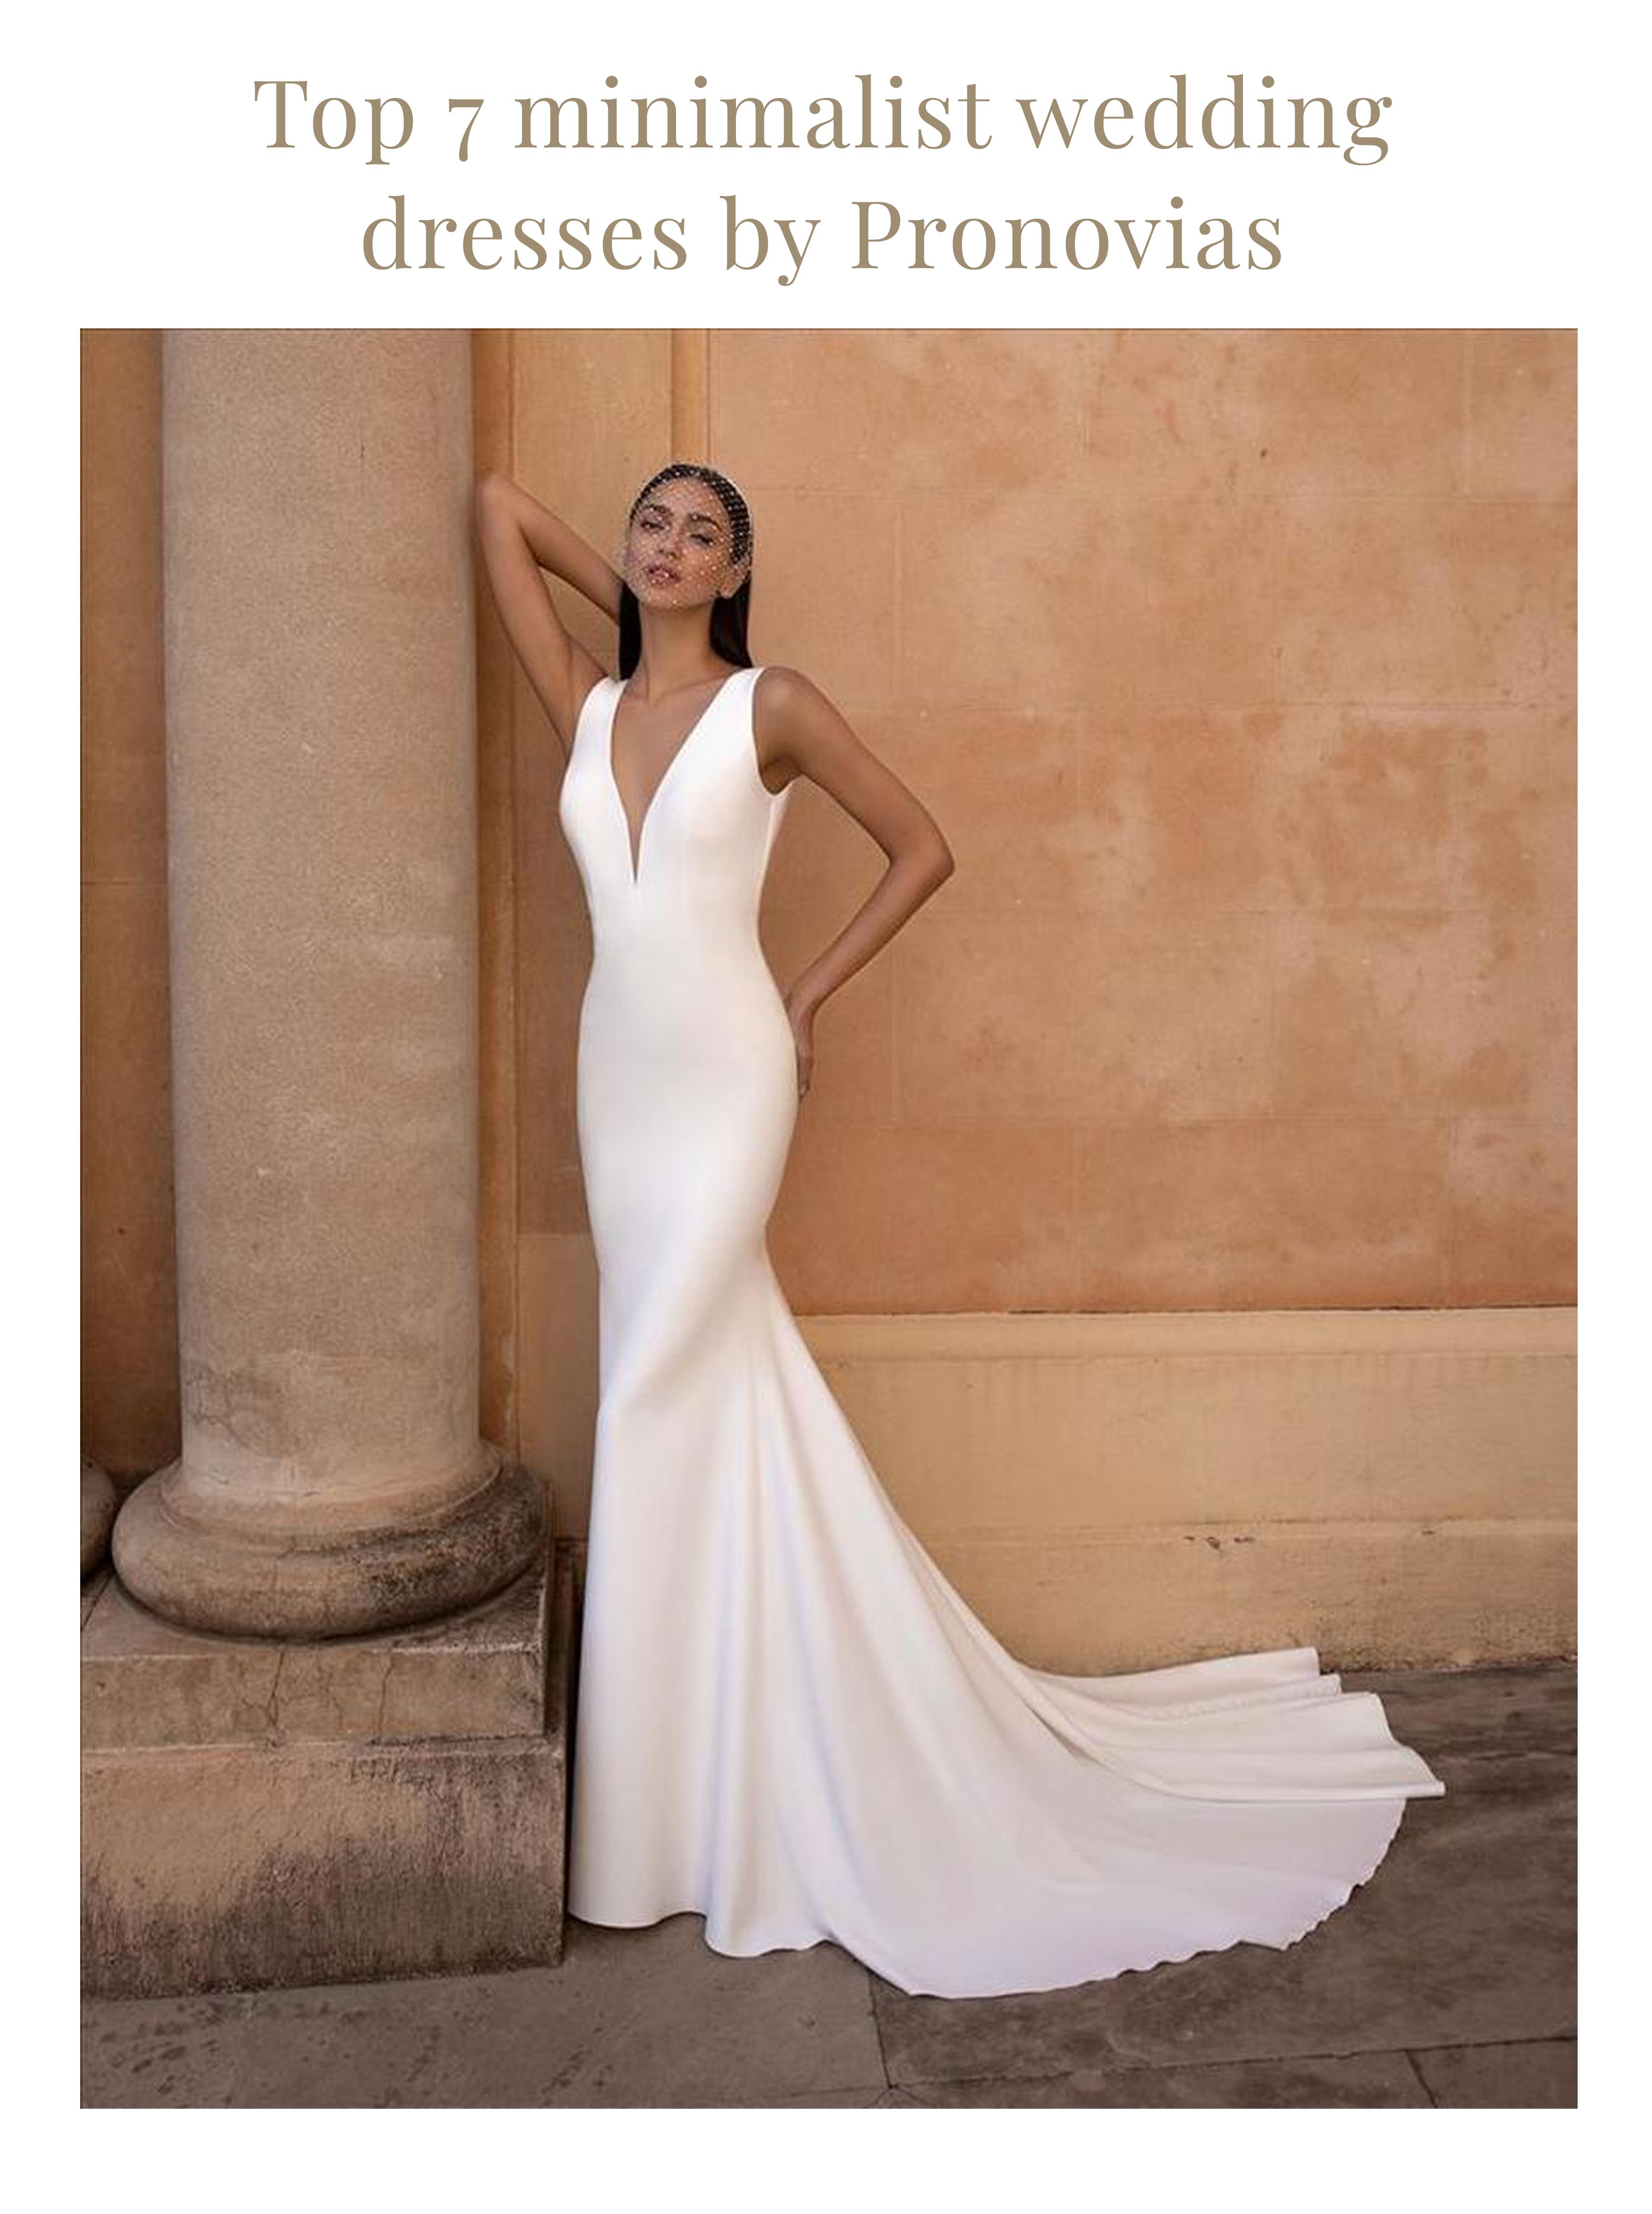 Top 20 Minimalist Wedding Dresses by Pronovias   Fashionably Yours ...